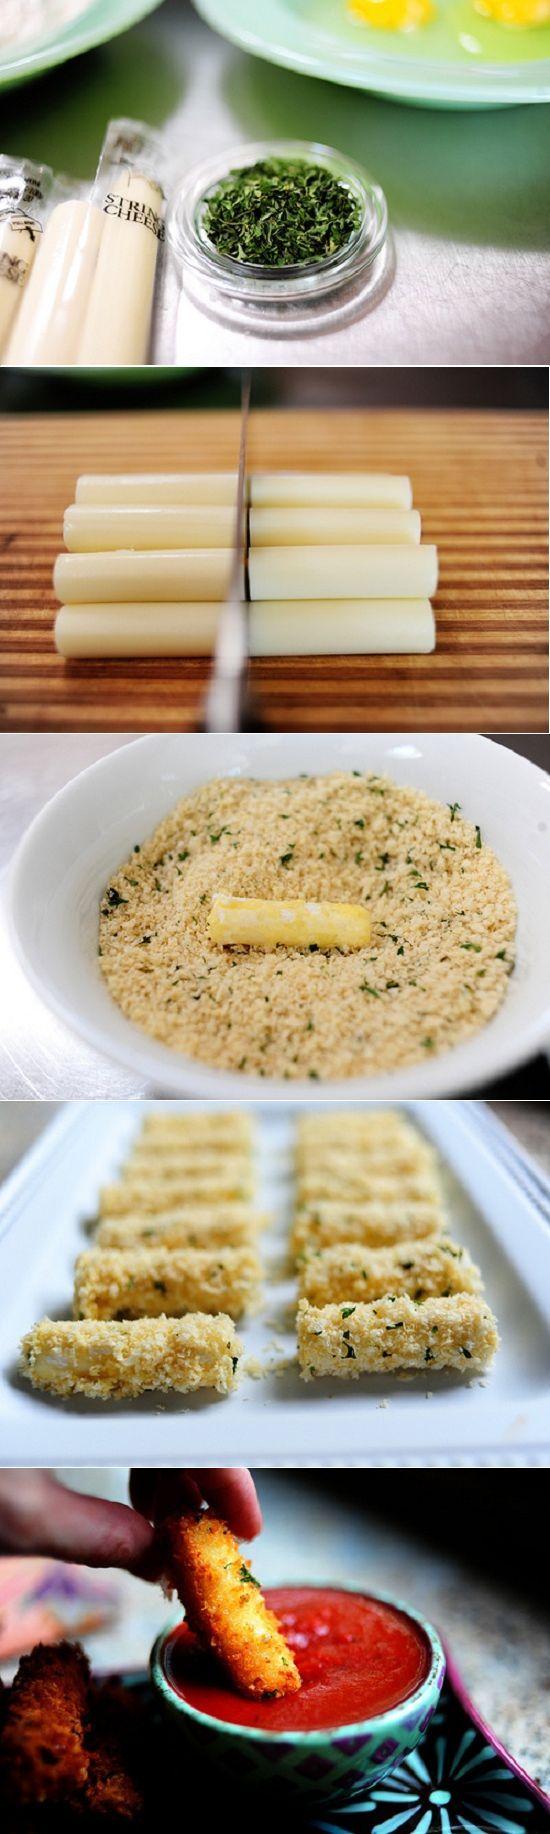 #macarrao #cook #pasta #kitchen #molho #cozinhar #comida